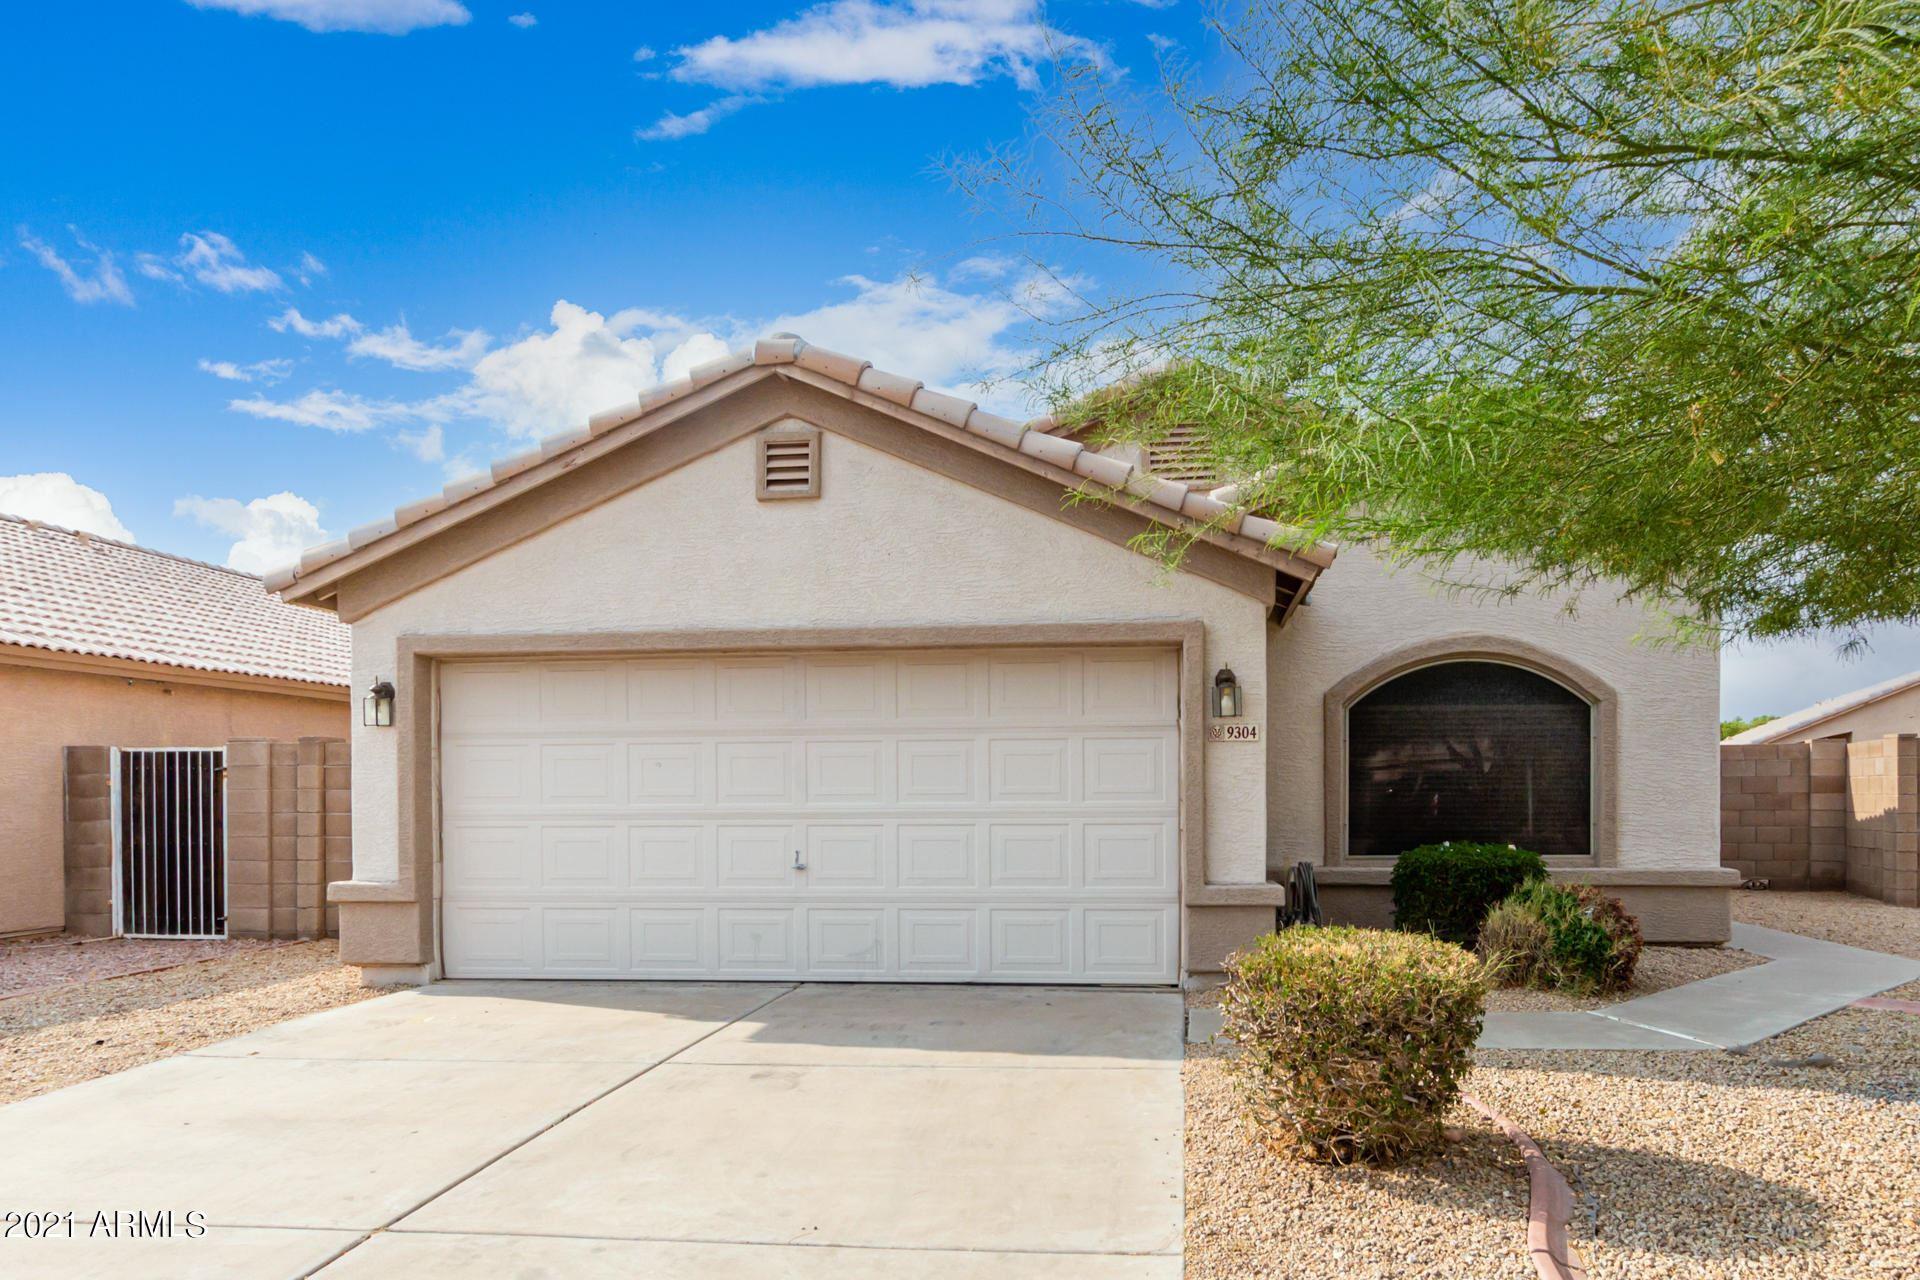 Photo of 9304 W CINNABAR Avenue, Peoria, AZ 85345 (MLS # 6269194)